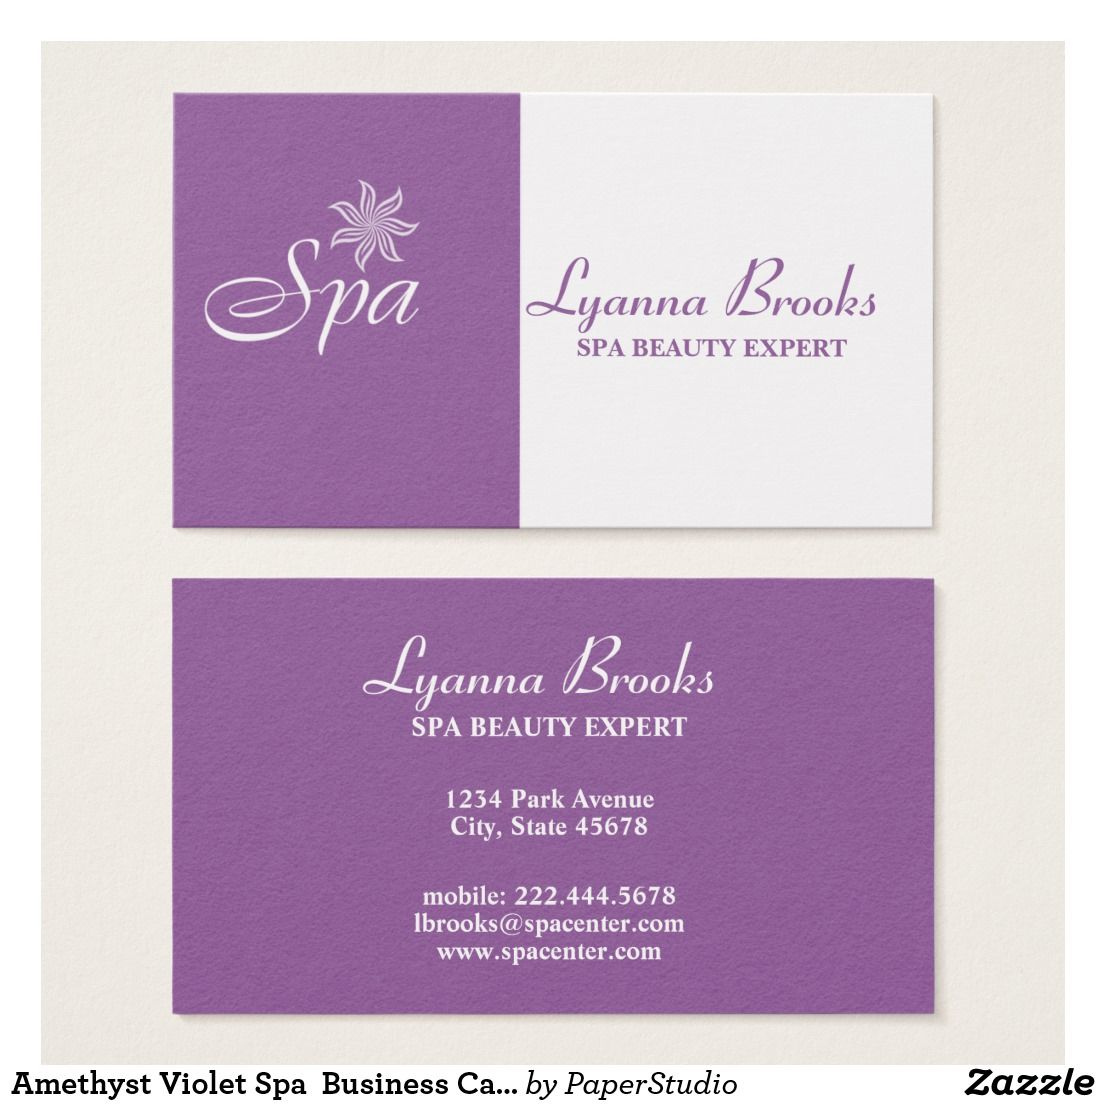 Amethyst Violet Spa Business Card | Business Cards | Pinterest ...